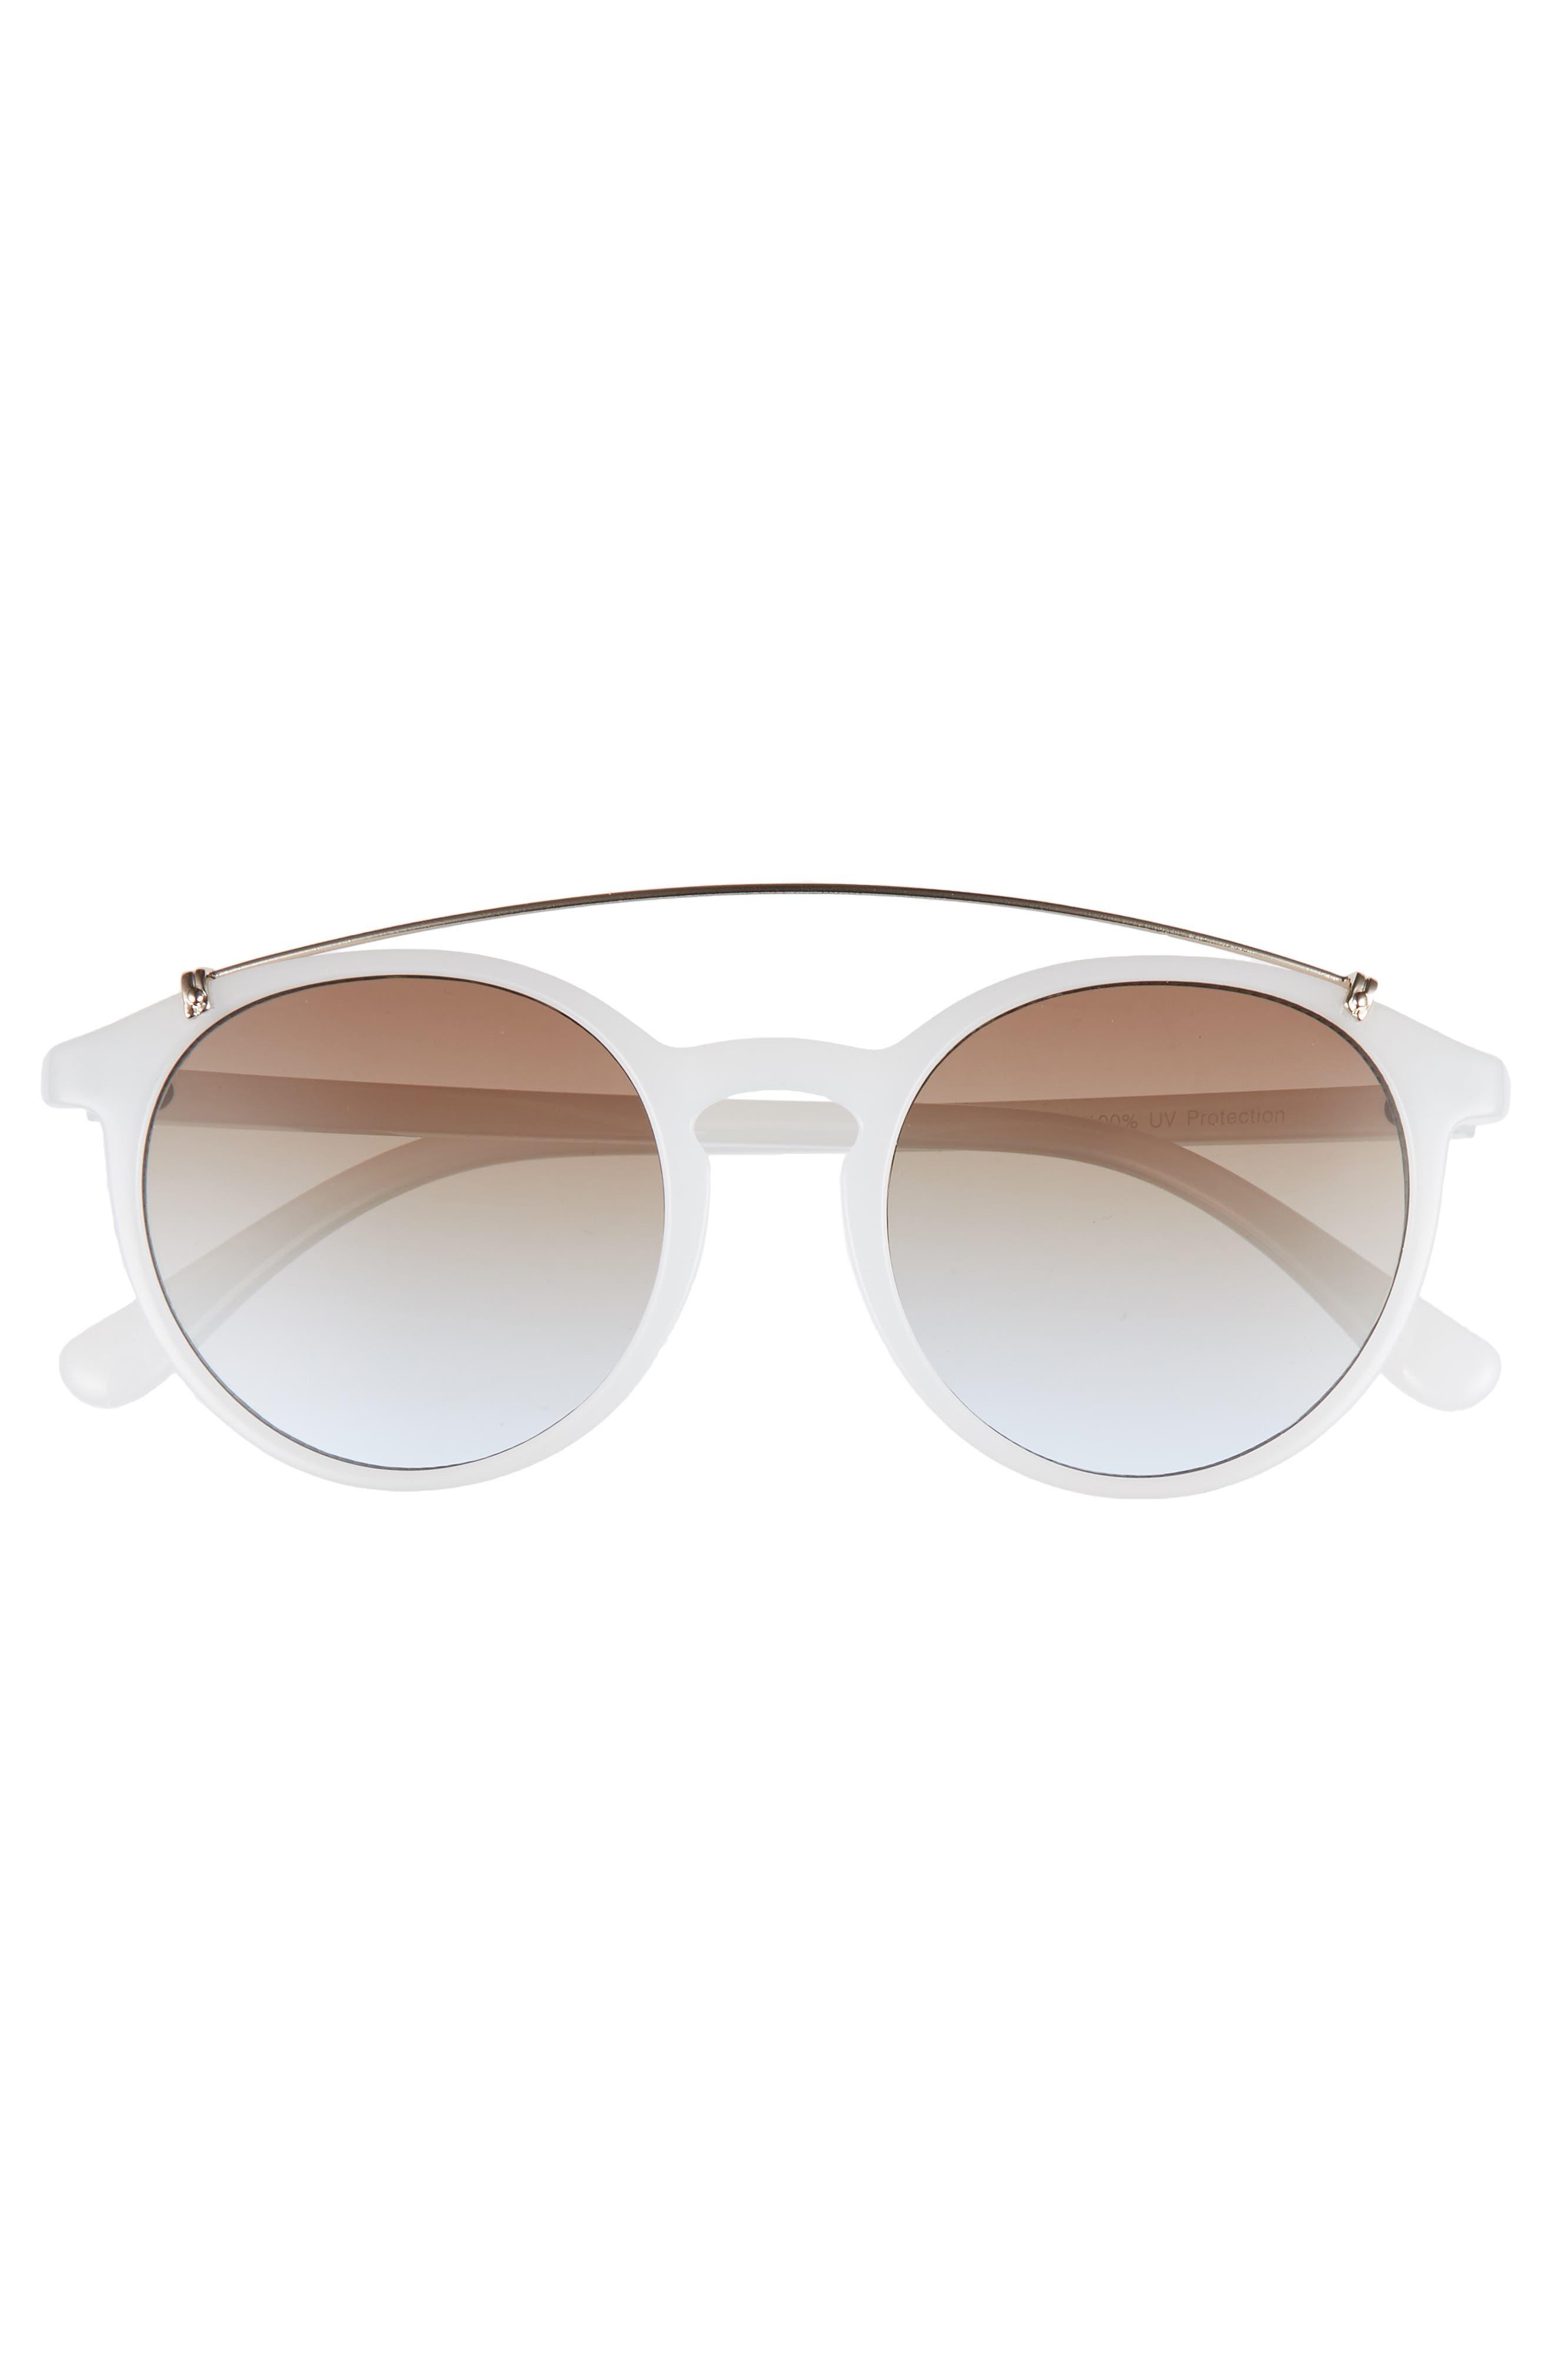 Round Aviator Sunglasses,                             Alternate thumbnail 3, color,                             Milky White/ Gold